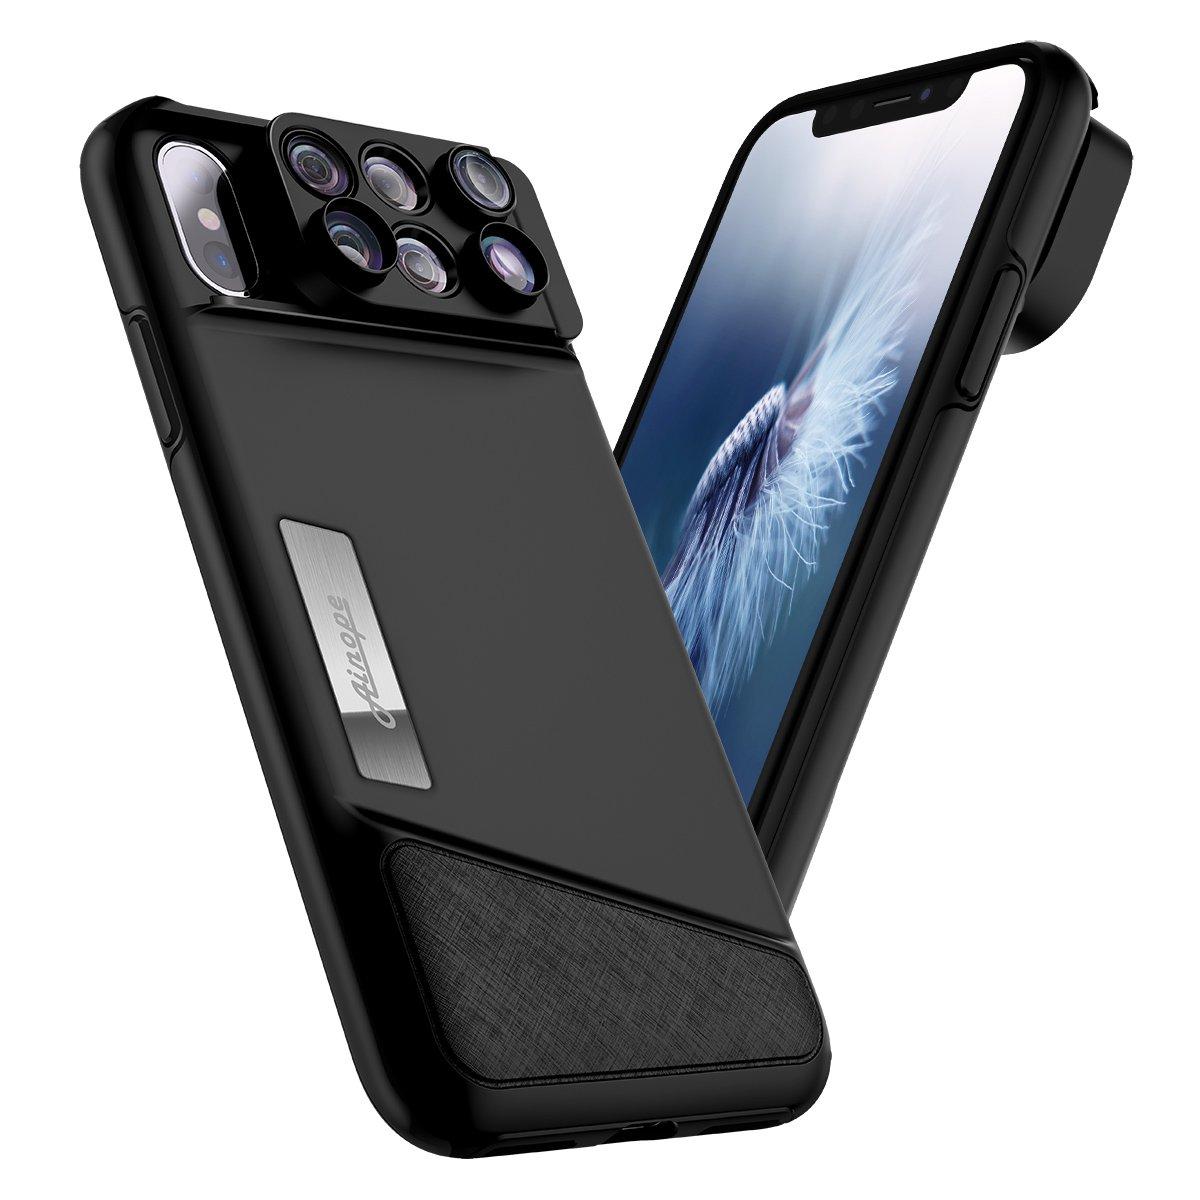 quality design eba13 57799 AINOPE iPhone X Lens, 4K HD [0.65X] Wide Angle, 15X Macro, 180° Fisheye  Camera Lenses Kit 3-in-1, Portable iPhone Xs Lens Kit for Apple iPhone  10/Xs ...